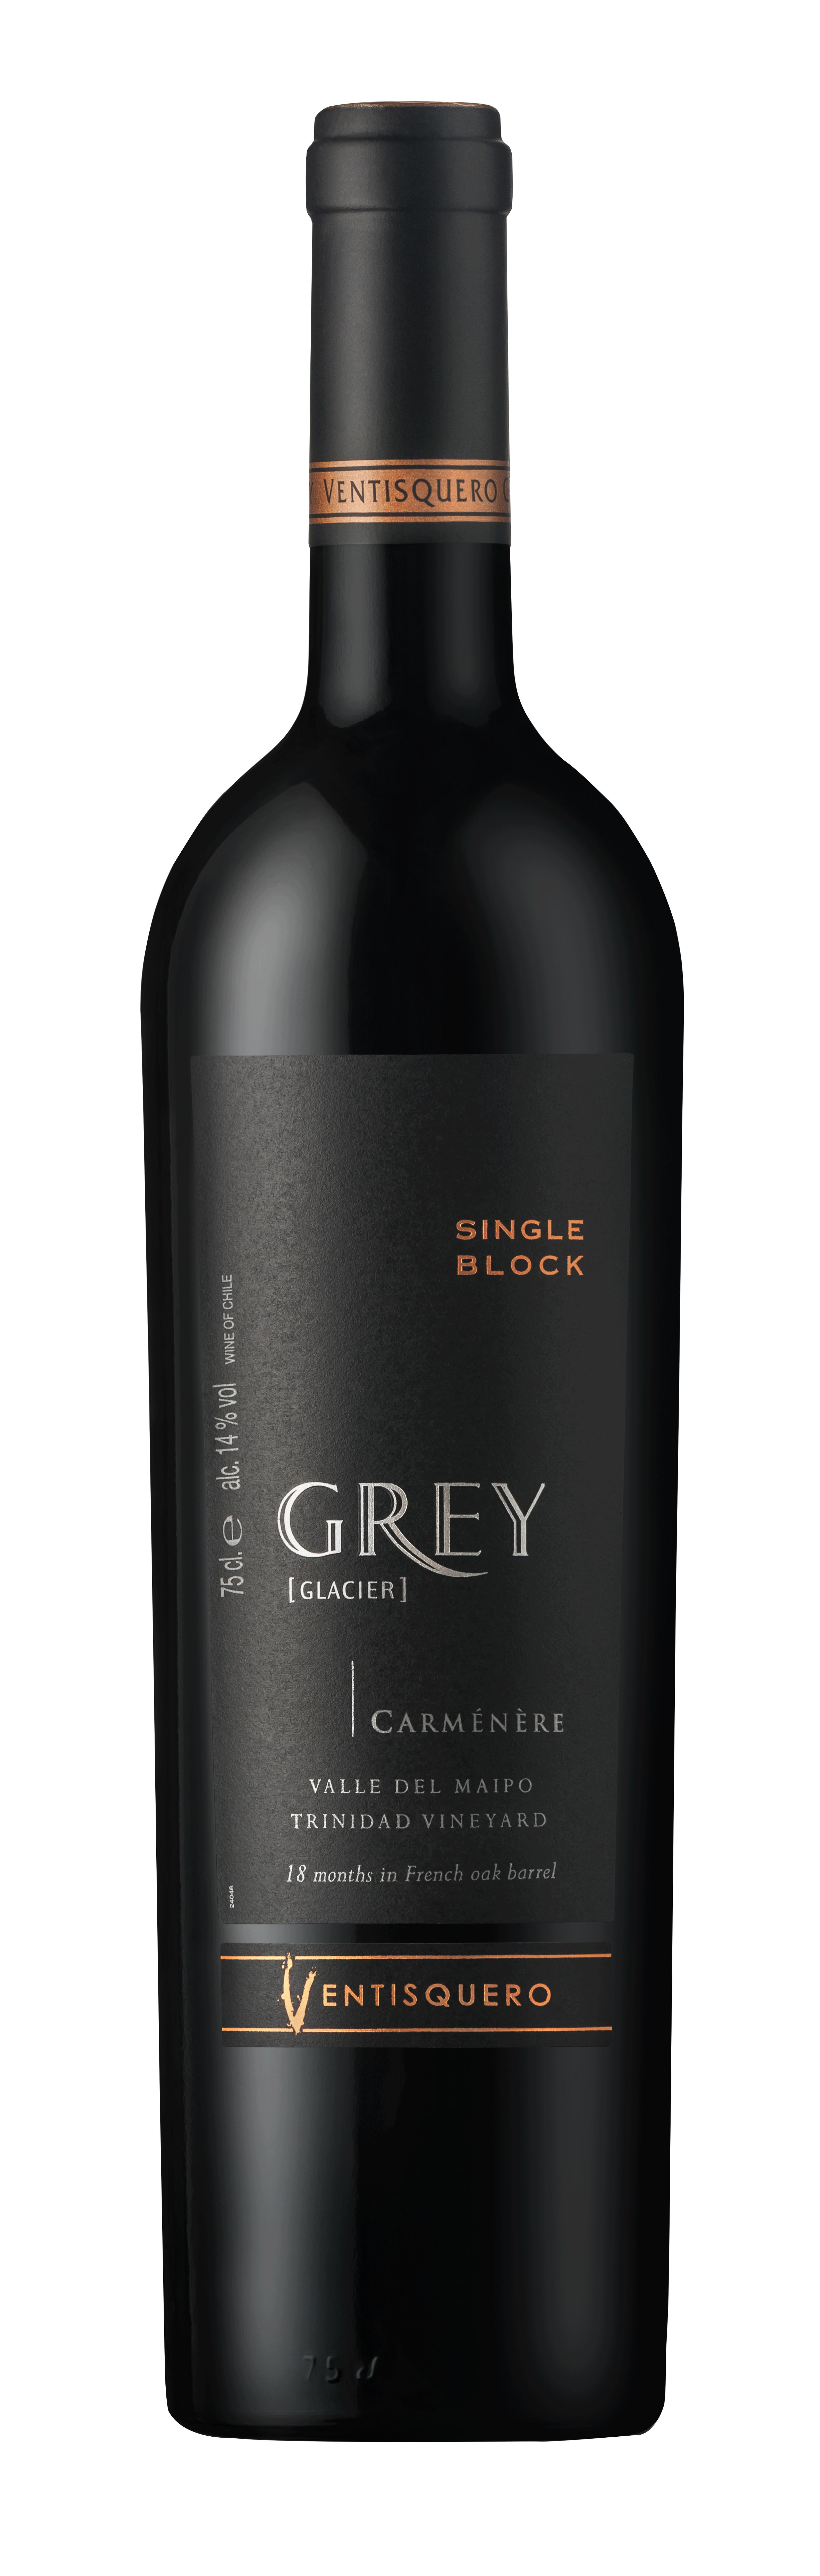 Grey Carmenere - Maipo Valley - Trinidad Vineyard